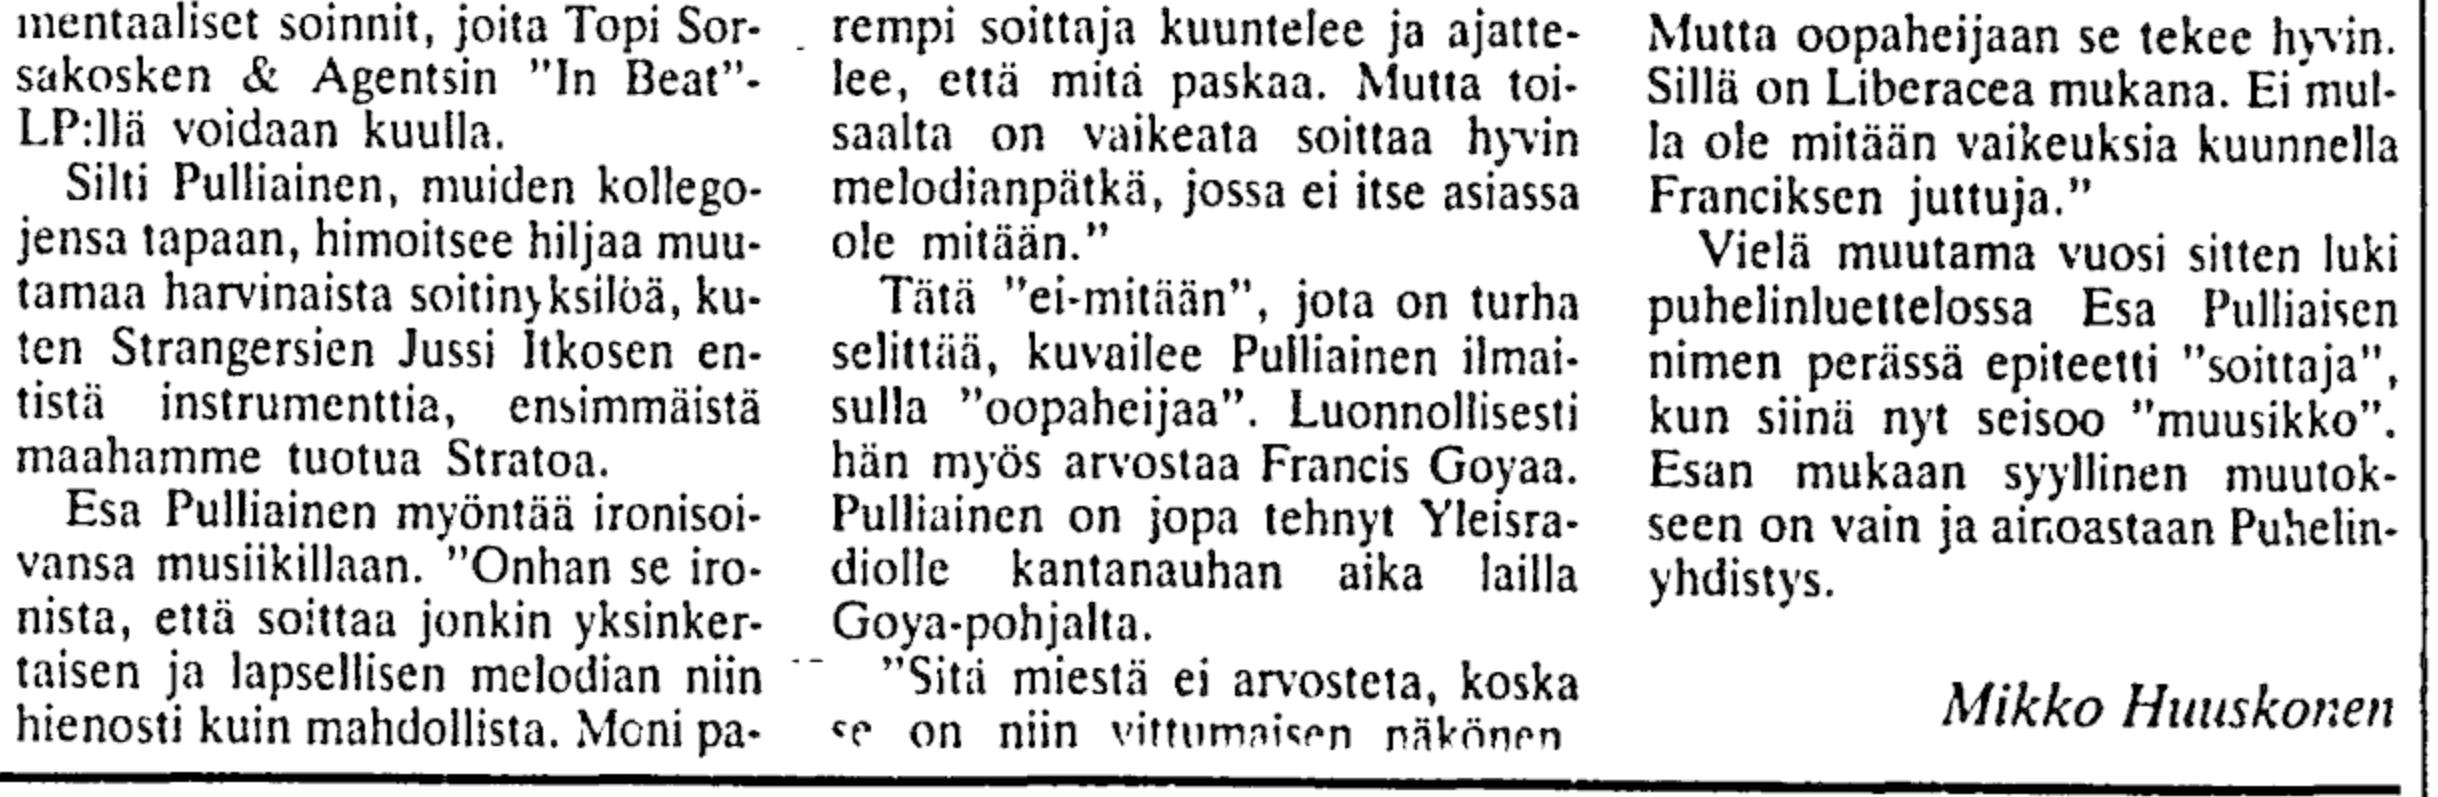 Helsingin Sanomat 28.6.1986